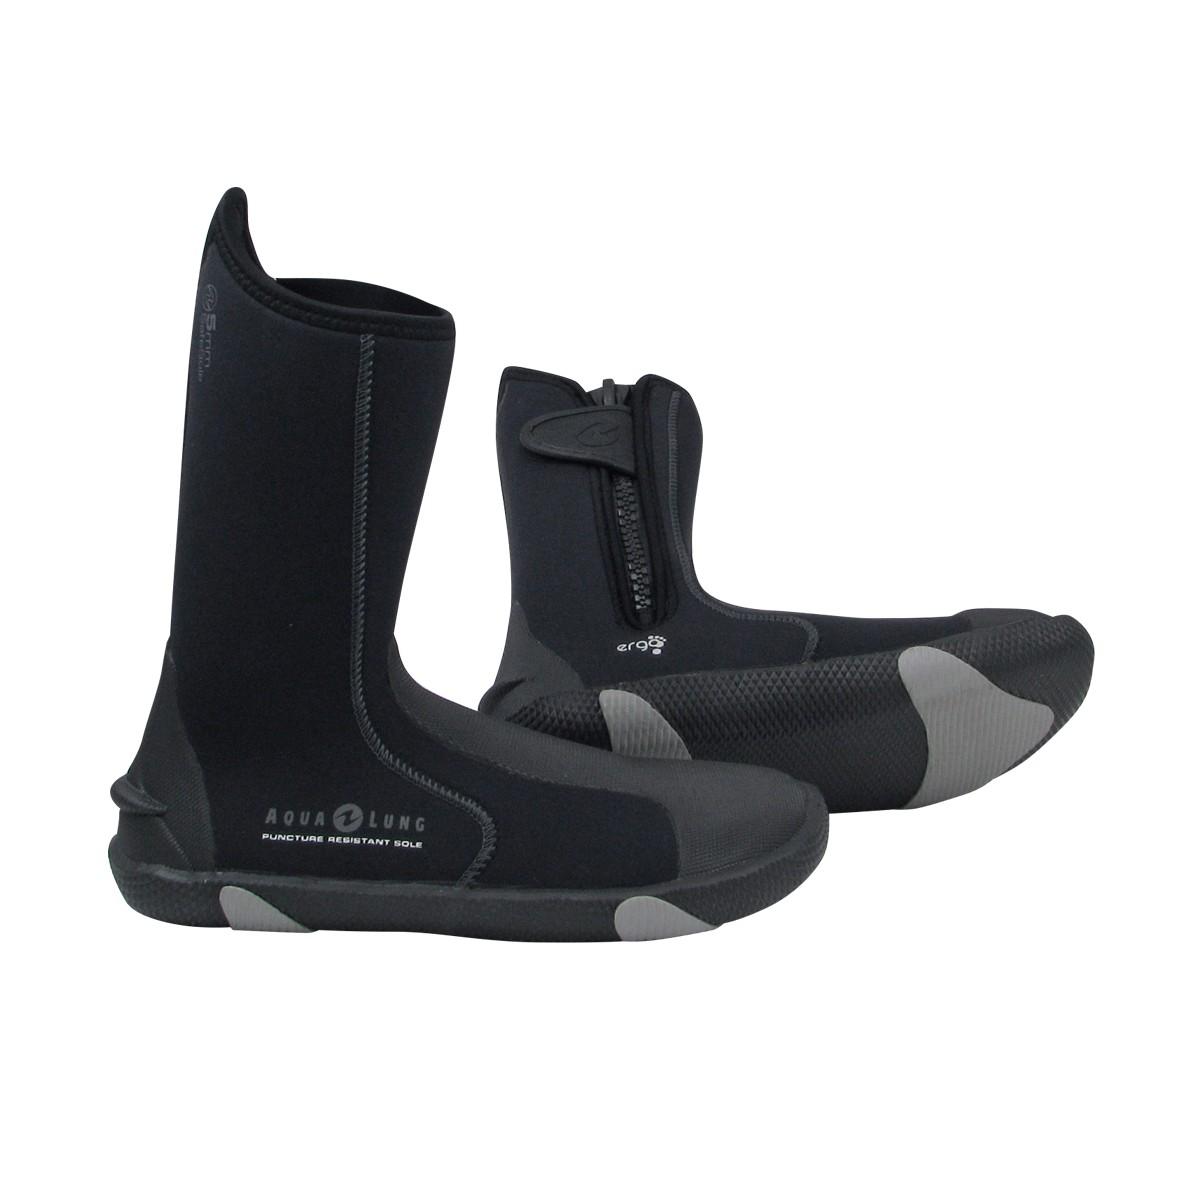 Aqua Lung Men's 6.5mm Safe Sole Ergo Boot